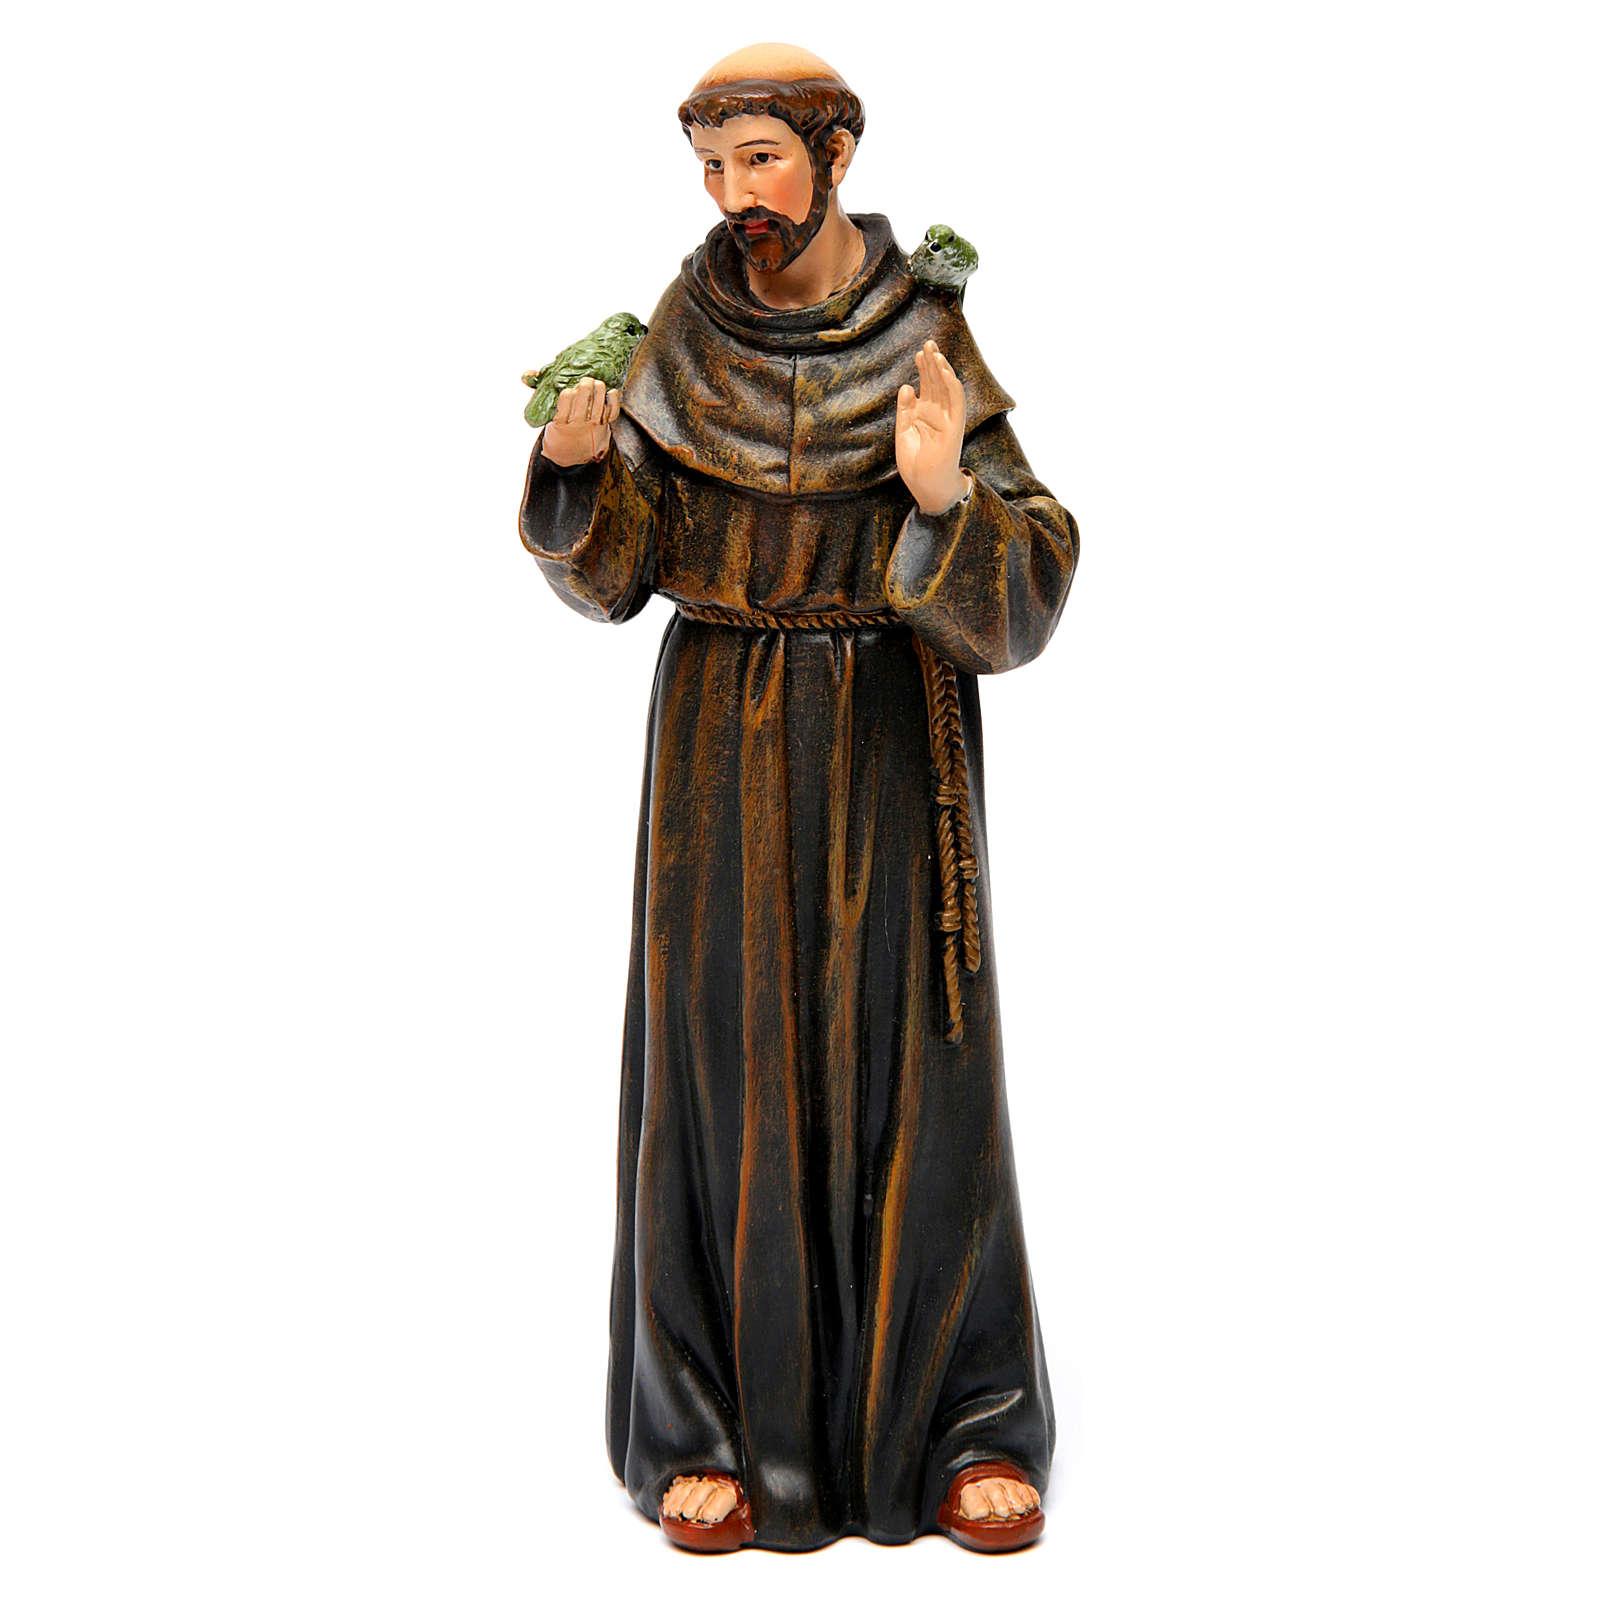 Saint Francis figure in painted wood pulp 15cm 4